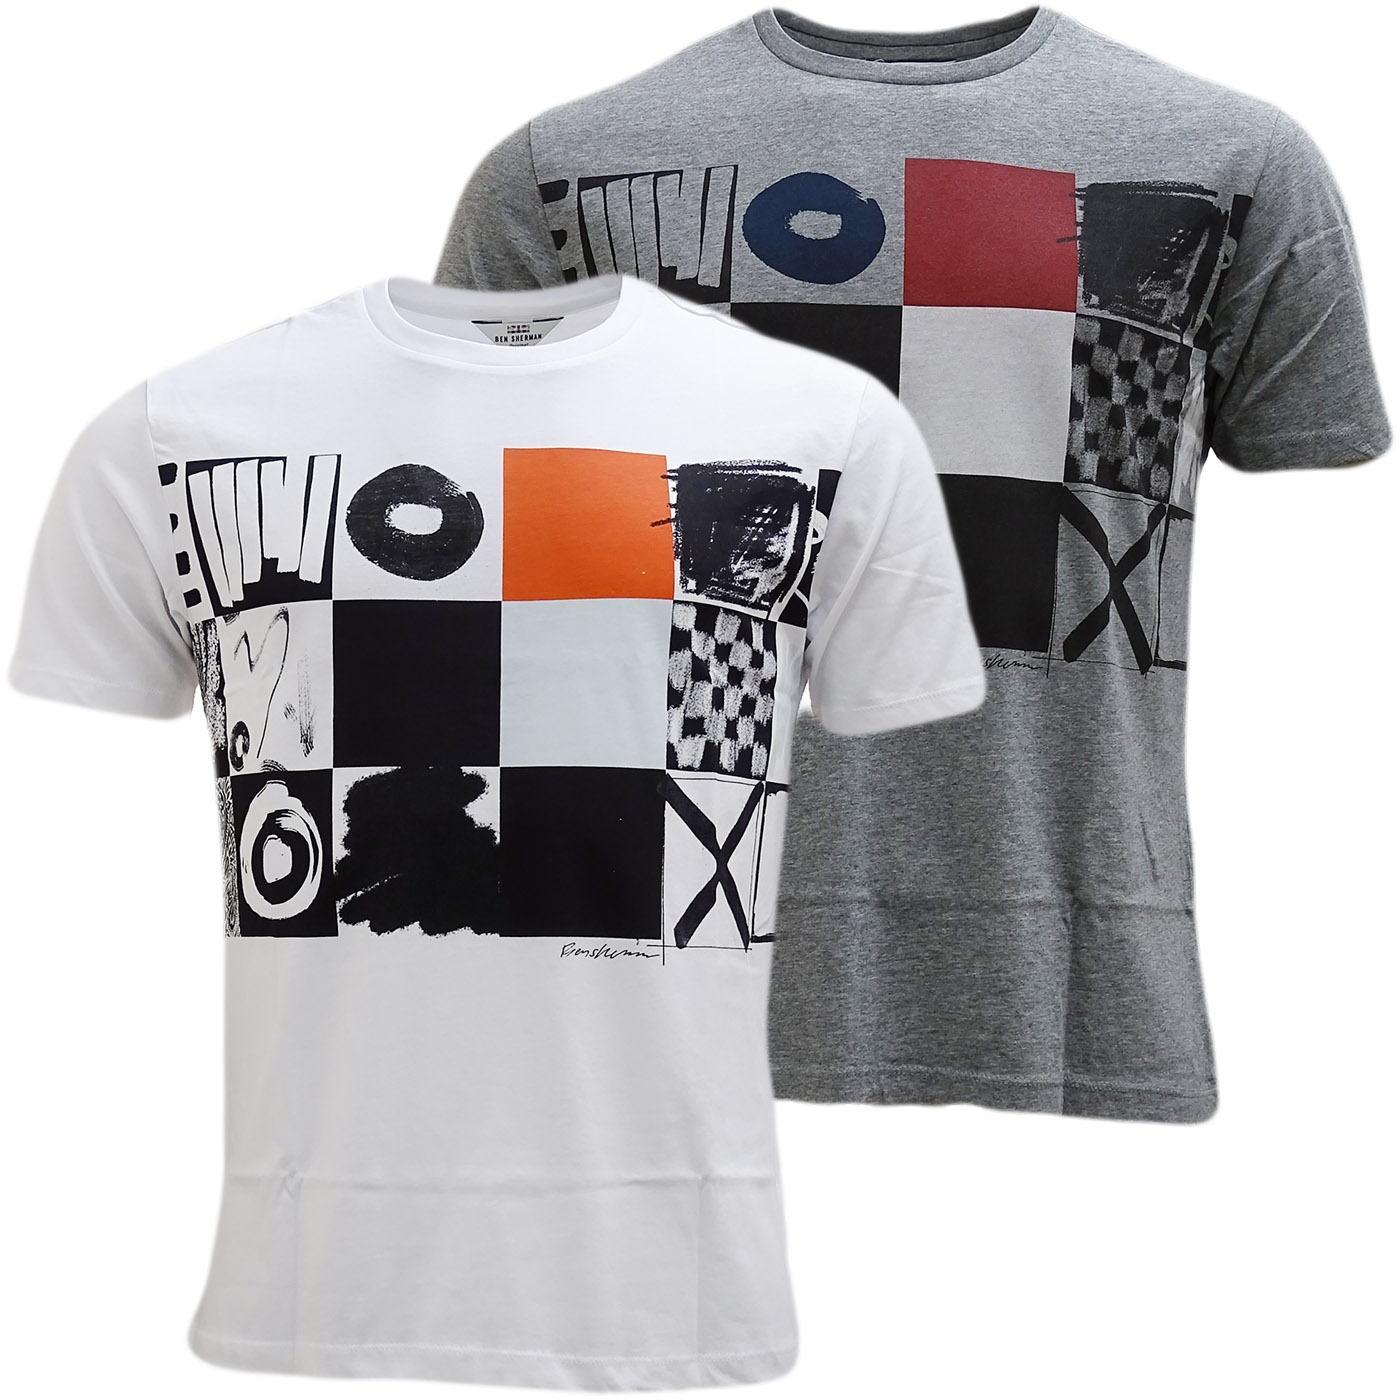 Ben Sherman Boxes T-Shirt - Mb13444